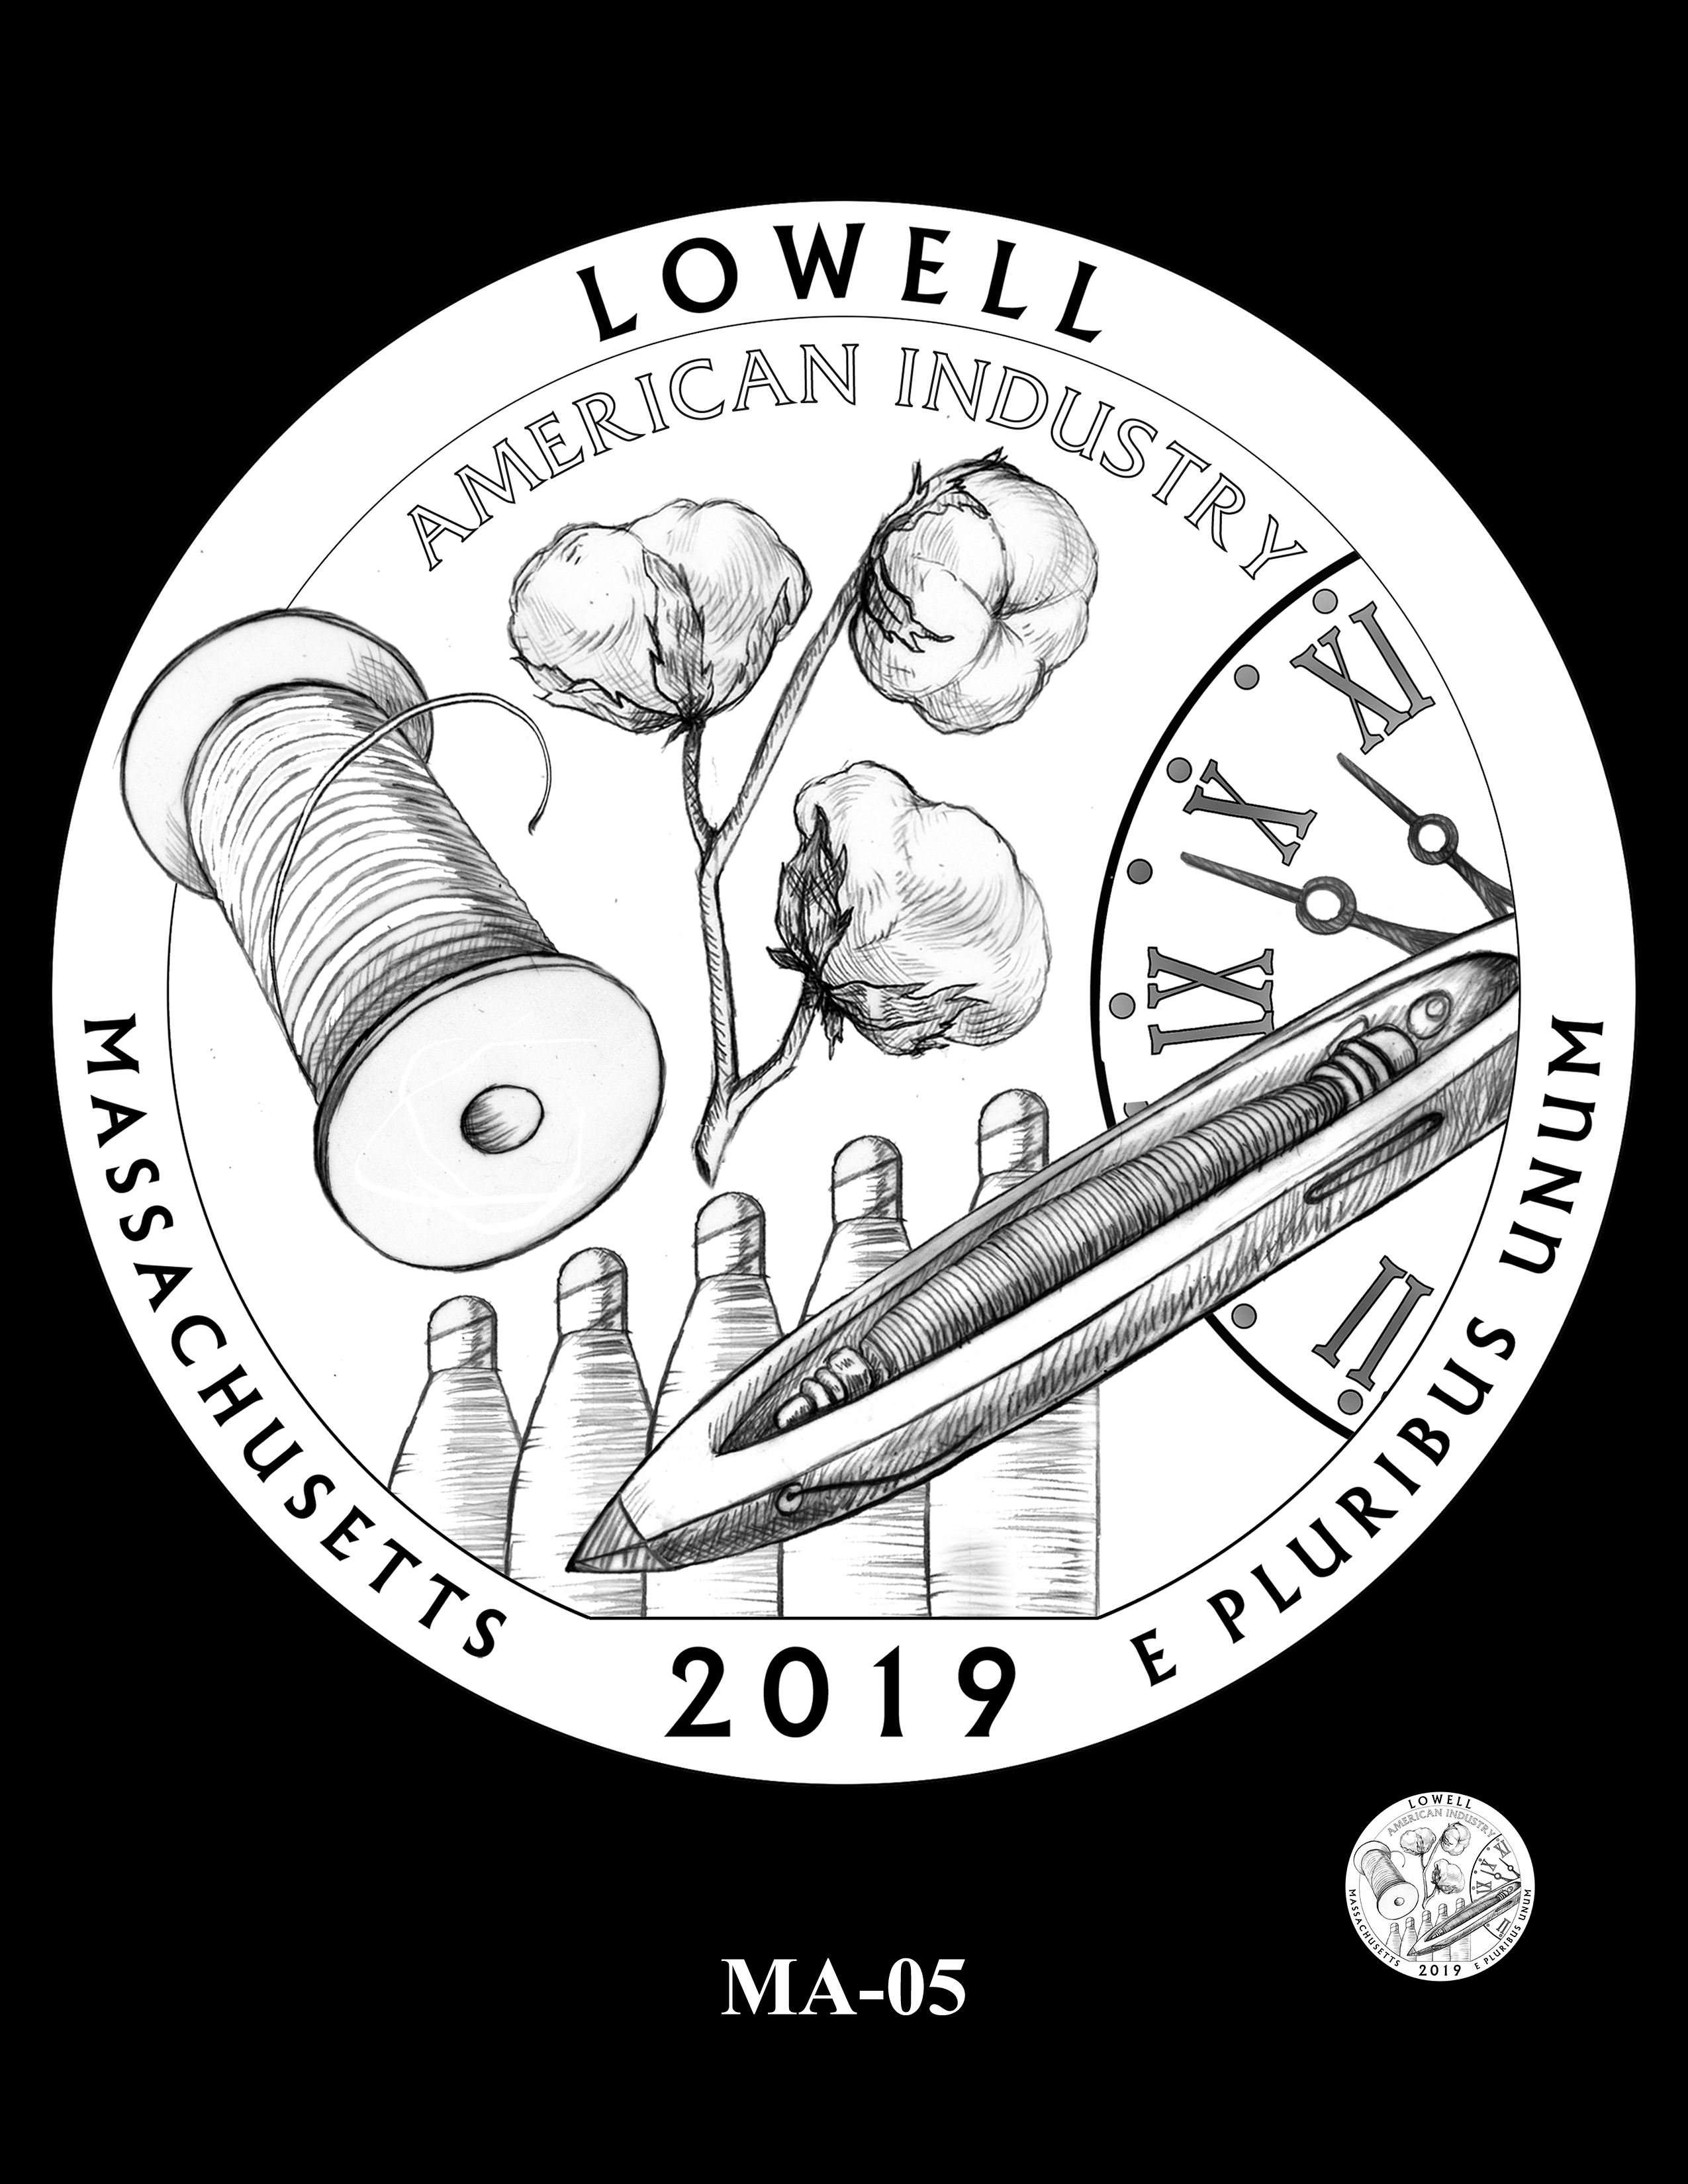 MA-05 -- 2019 America the Beautiful Quarters® Program